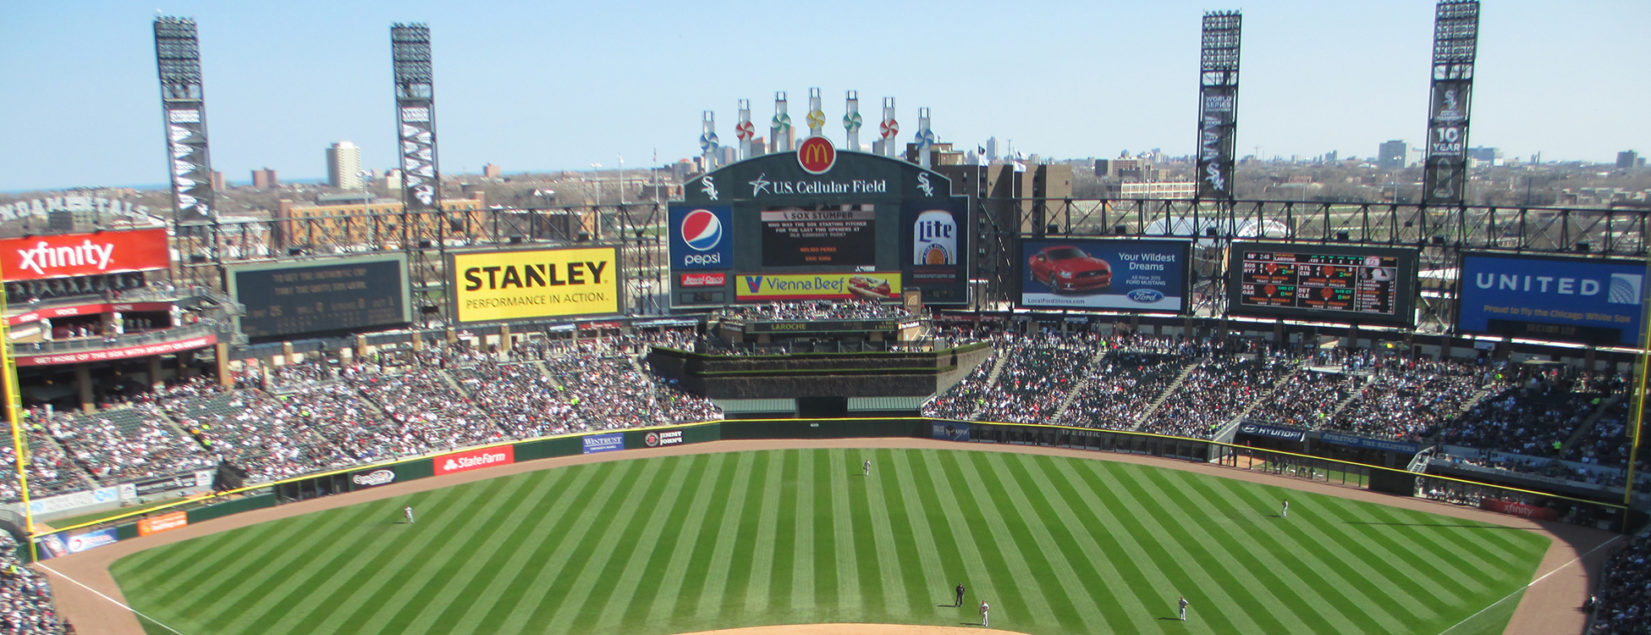 guides to professional mlb baseball ballparks mlb ballpark guides